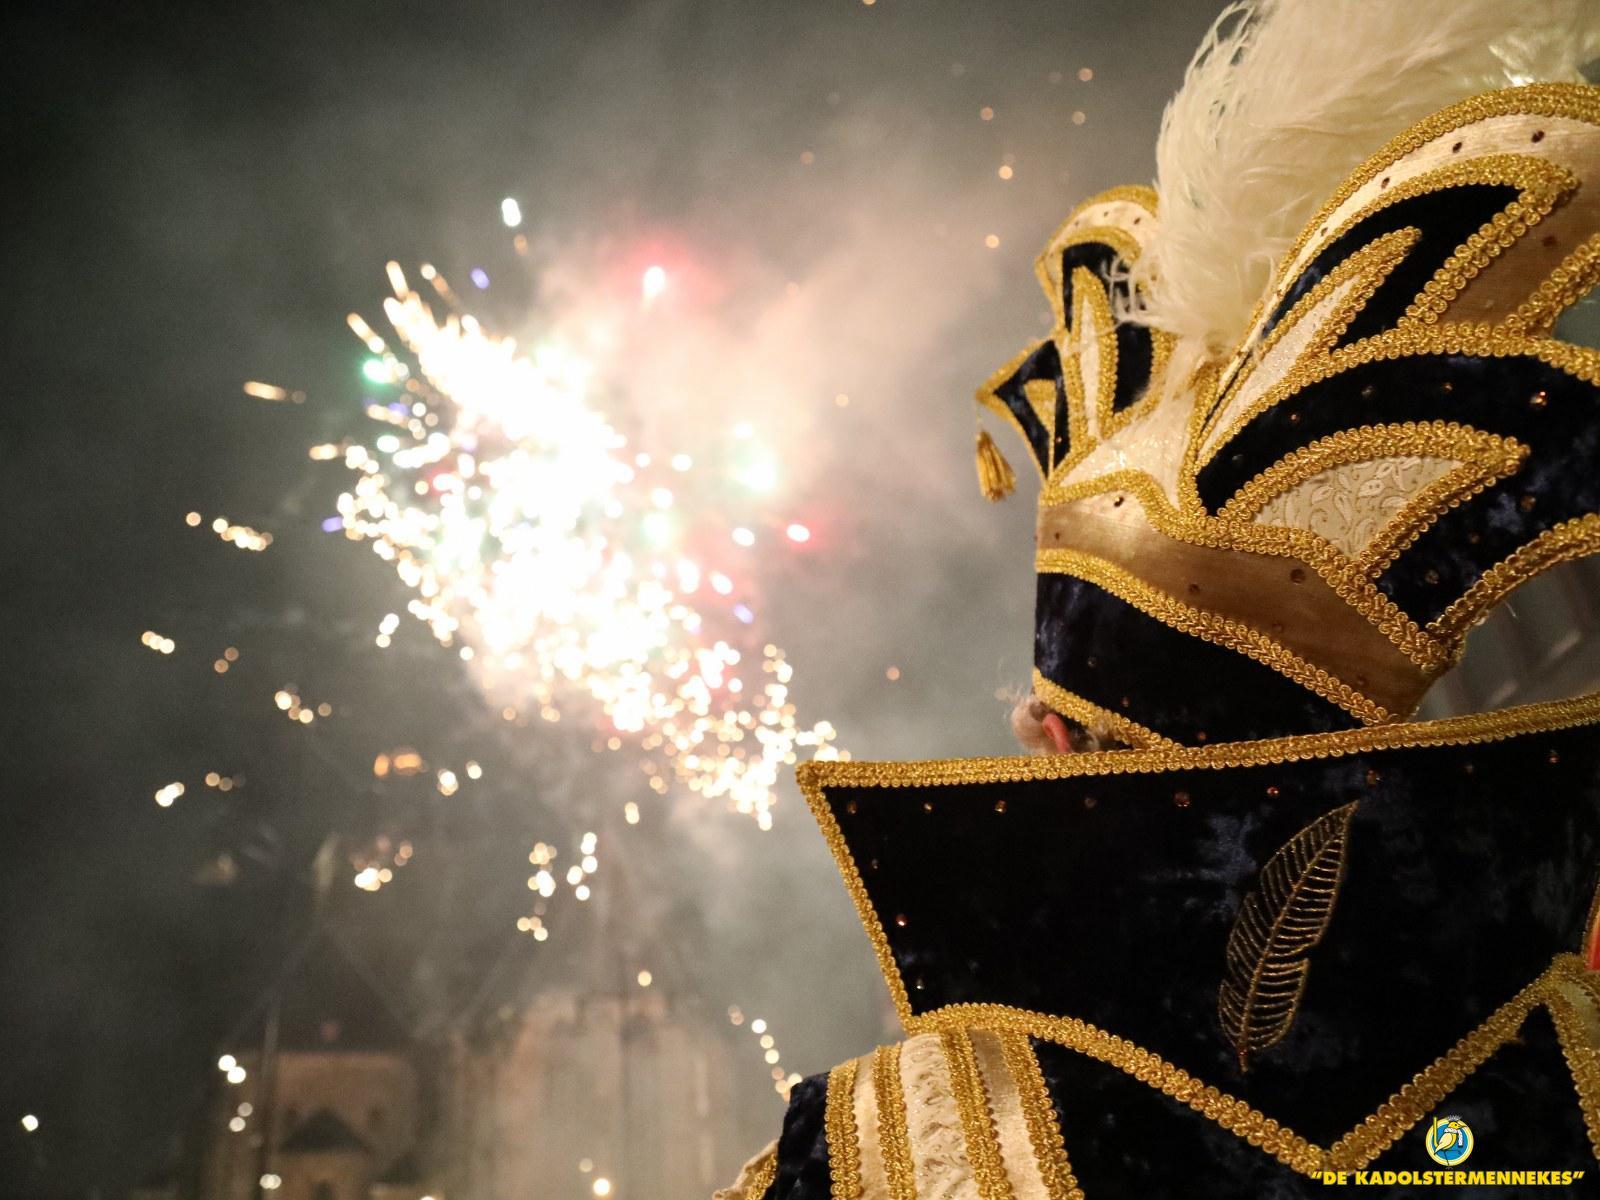 Bokverbranden betekent einde carnaval, het was een onwies mooi joar